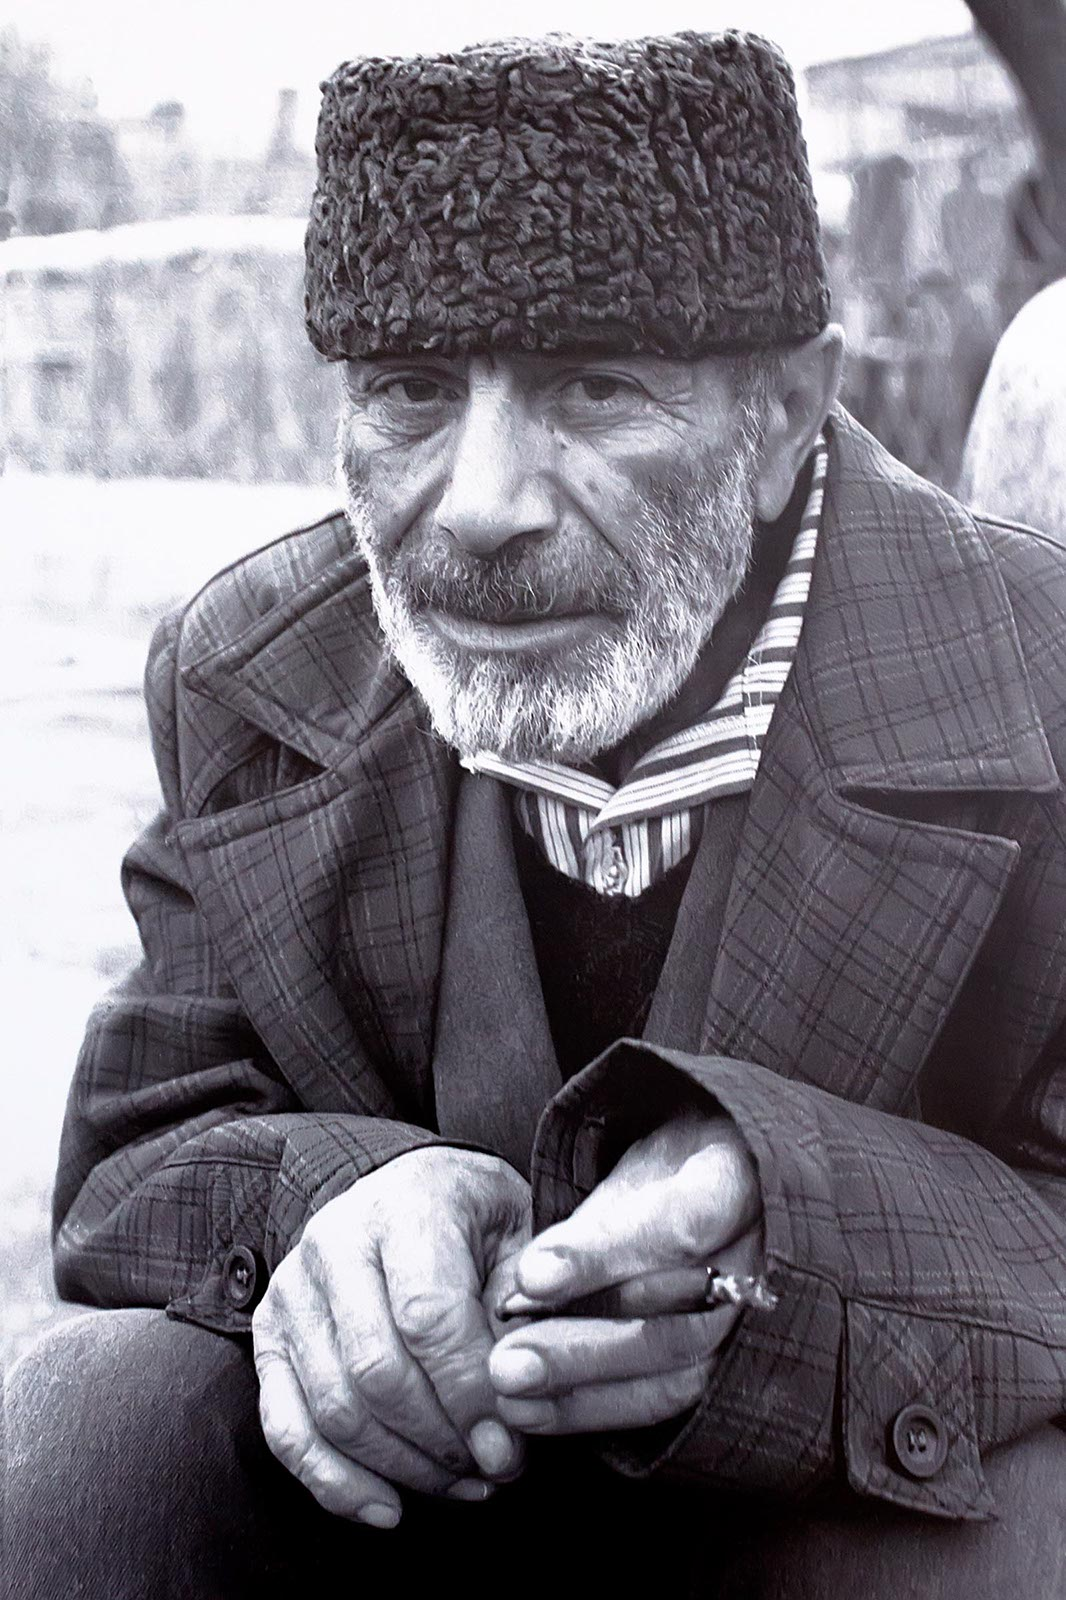 Фото №178964. Р.Якупов. Портрет Хайри АГА. 1994